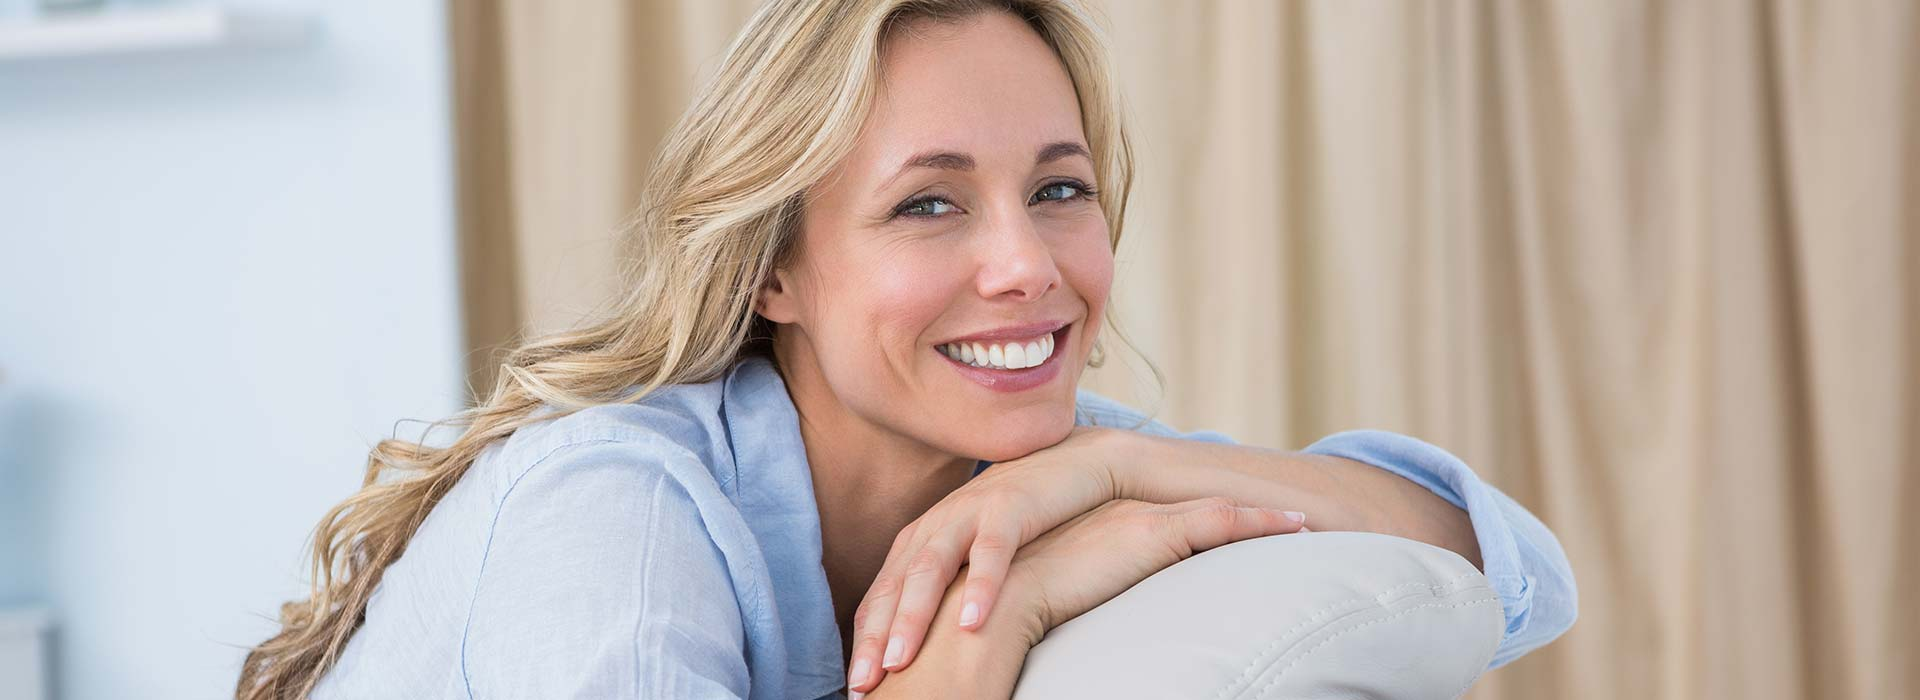 Dental-implant-surgery-Mornington